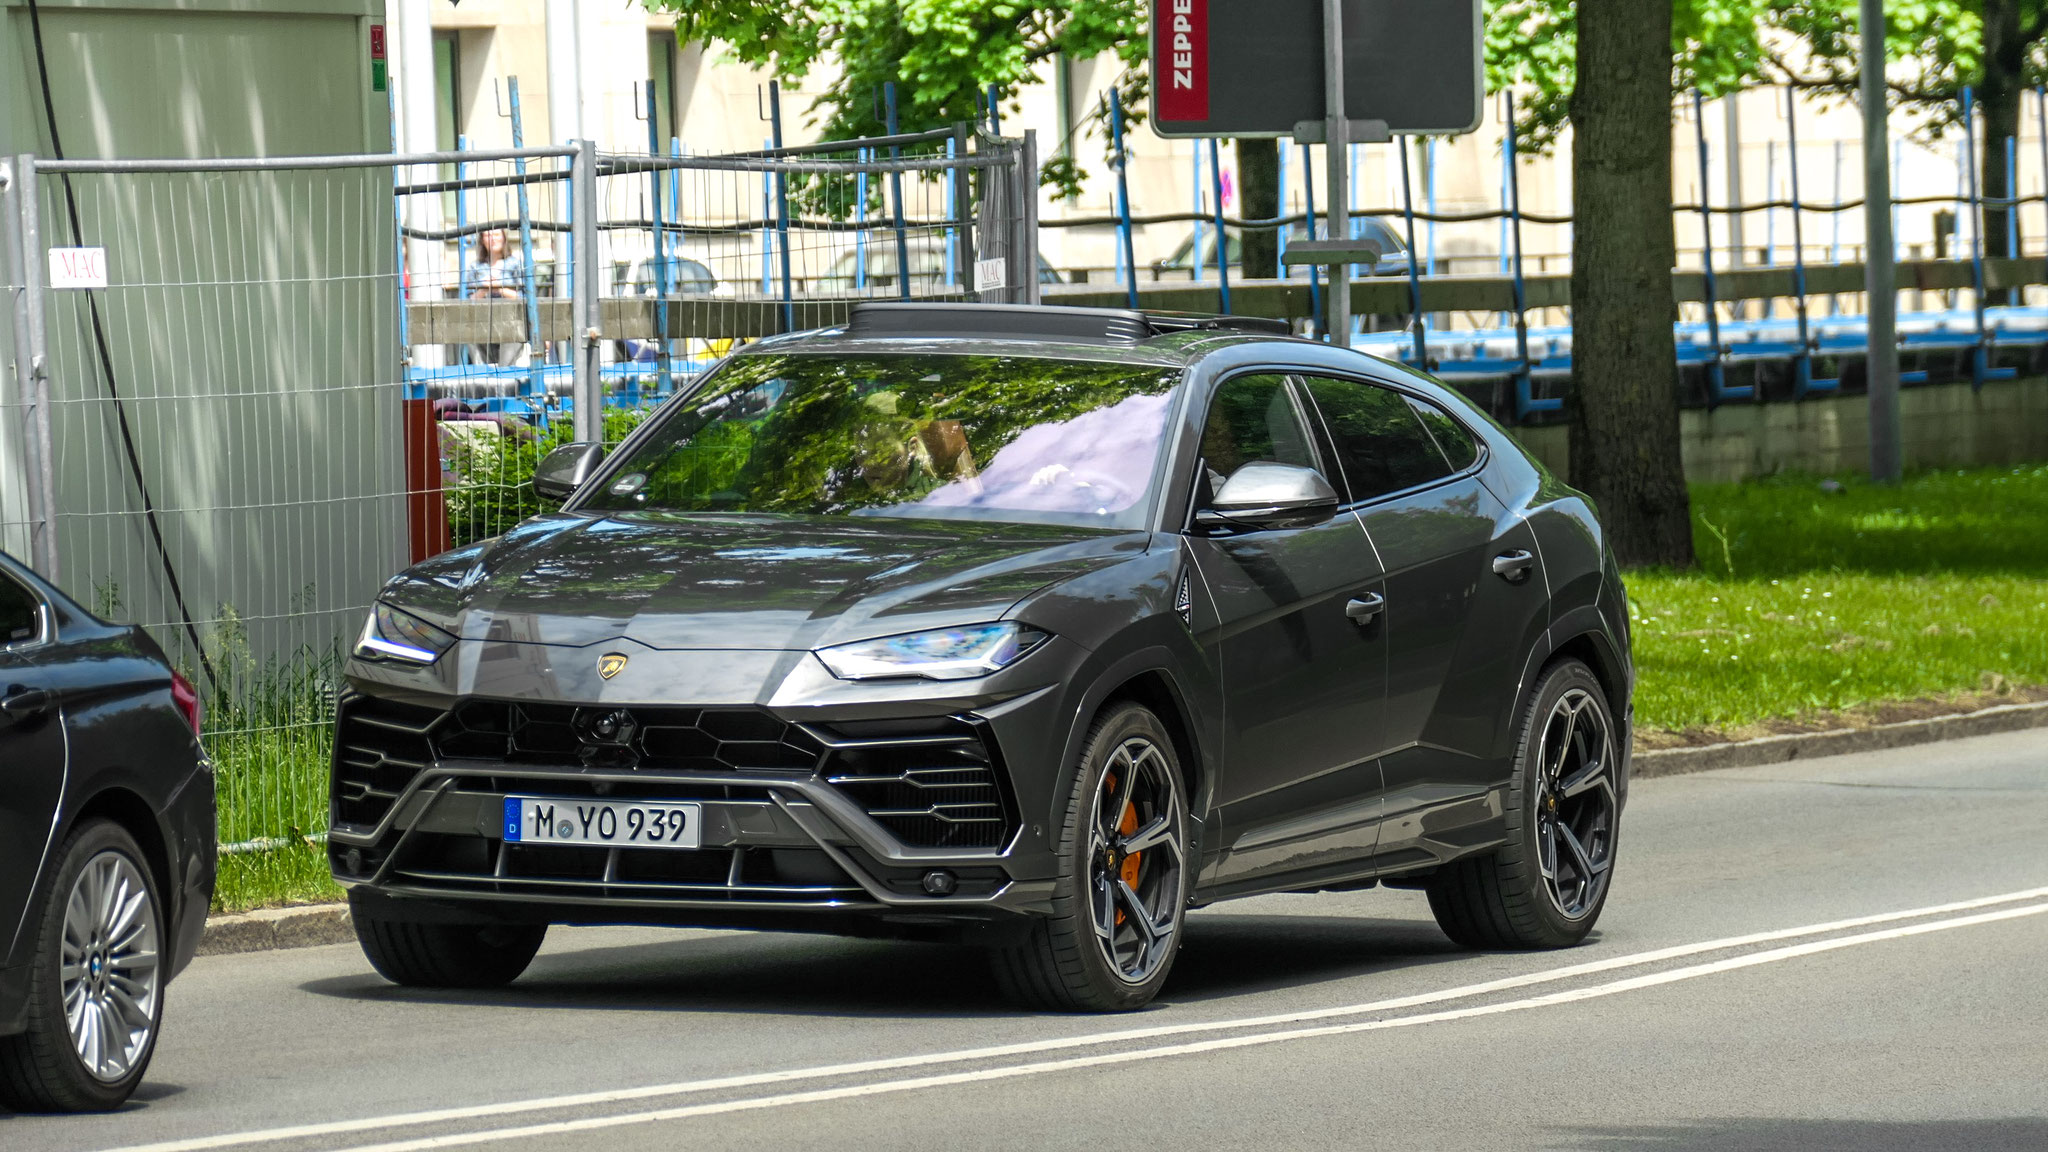 Lamborghini Urus - M-YO-939